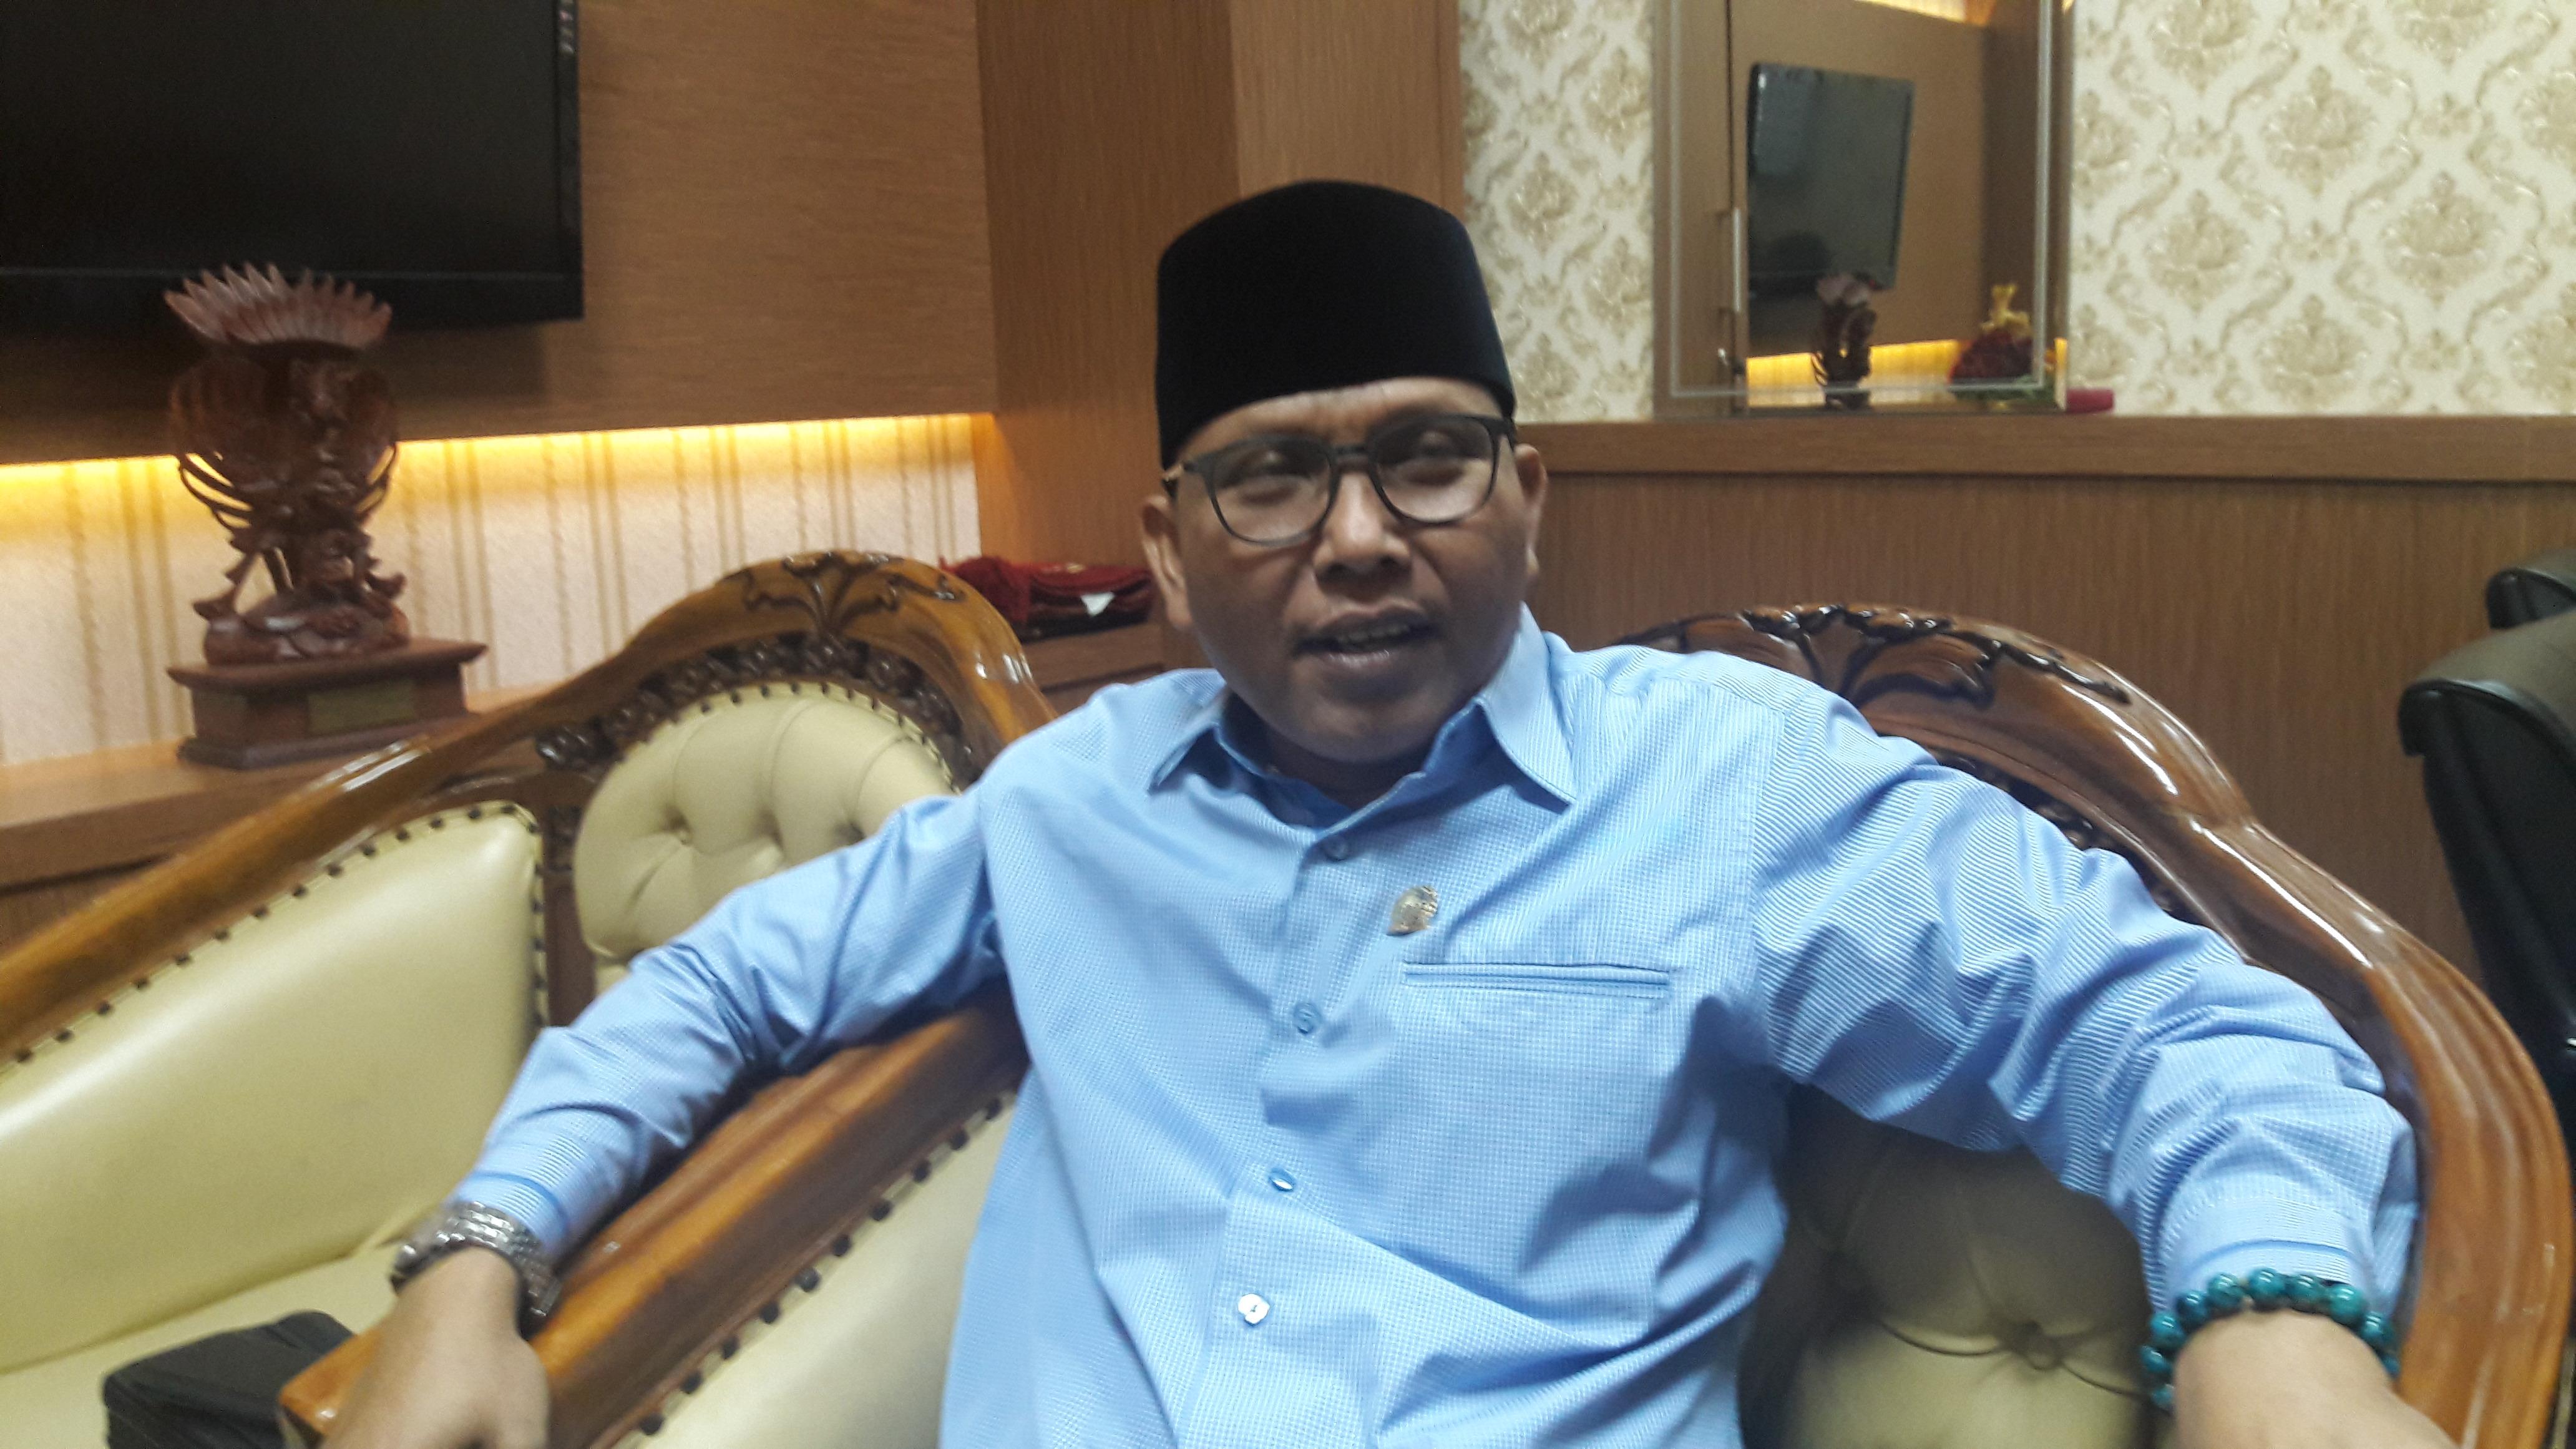 Ketua Komisi B DPRD Jatim Aliyadi Mustofa. (Foto: Setya W/NUSANTARANEWS.CO)